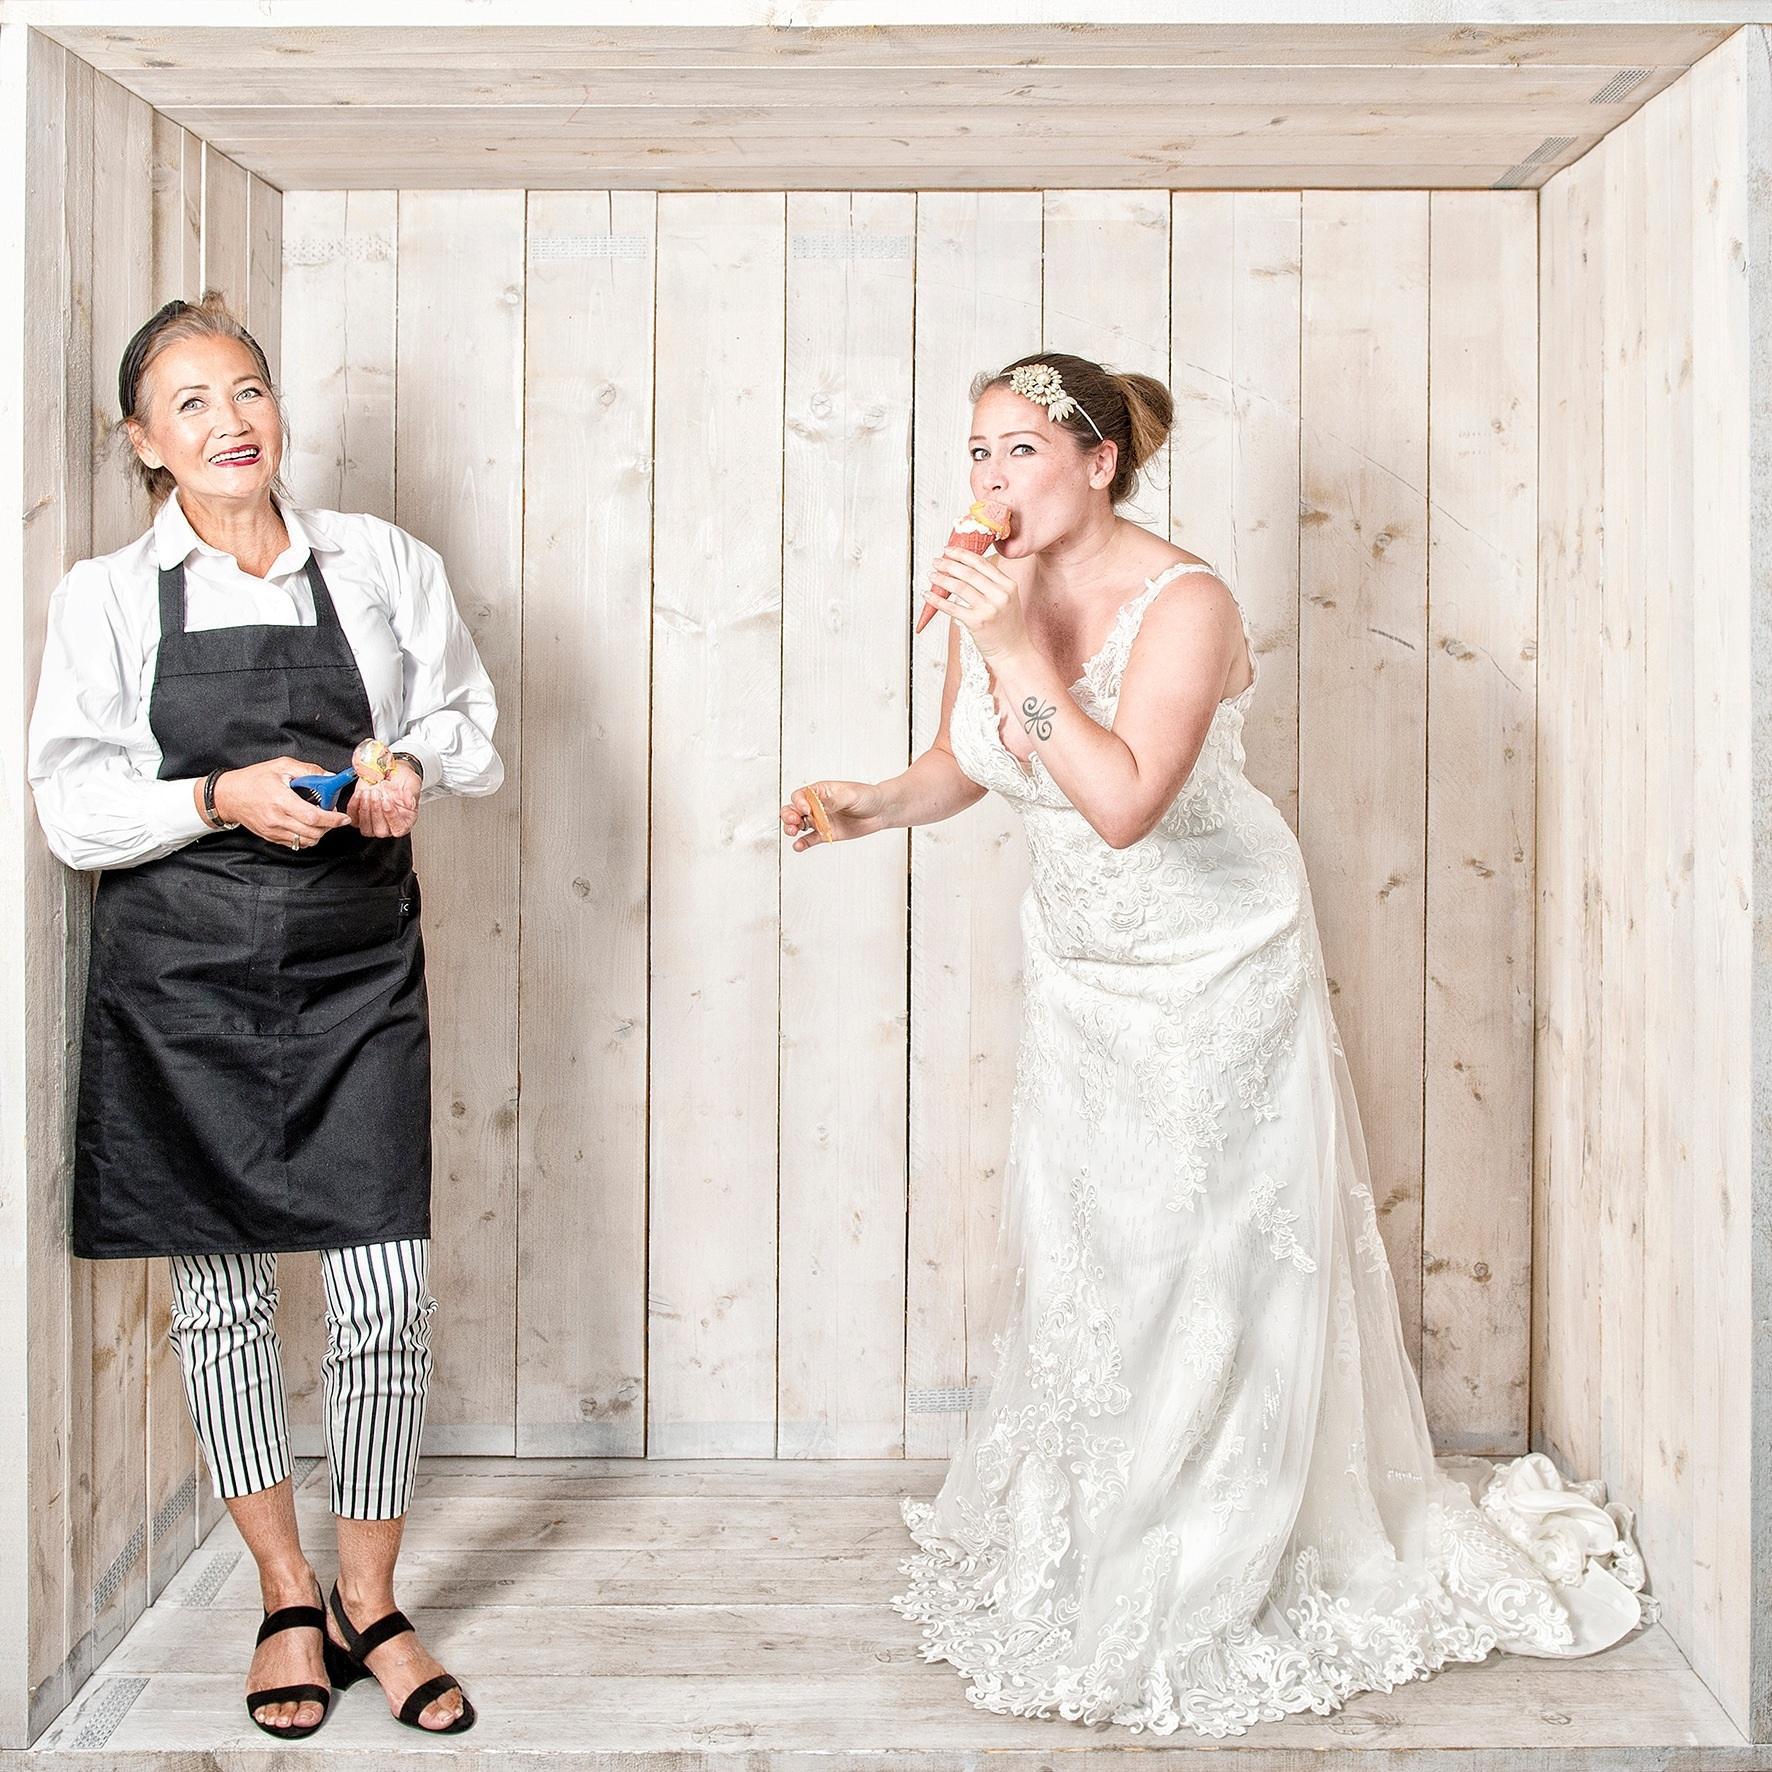 Hilly lefeber ondernemer bruidsmodezaak ijssalon